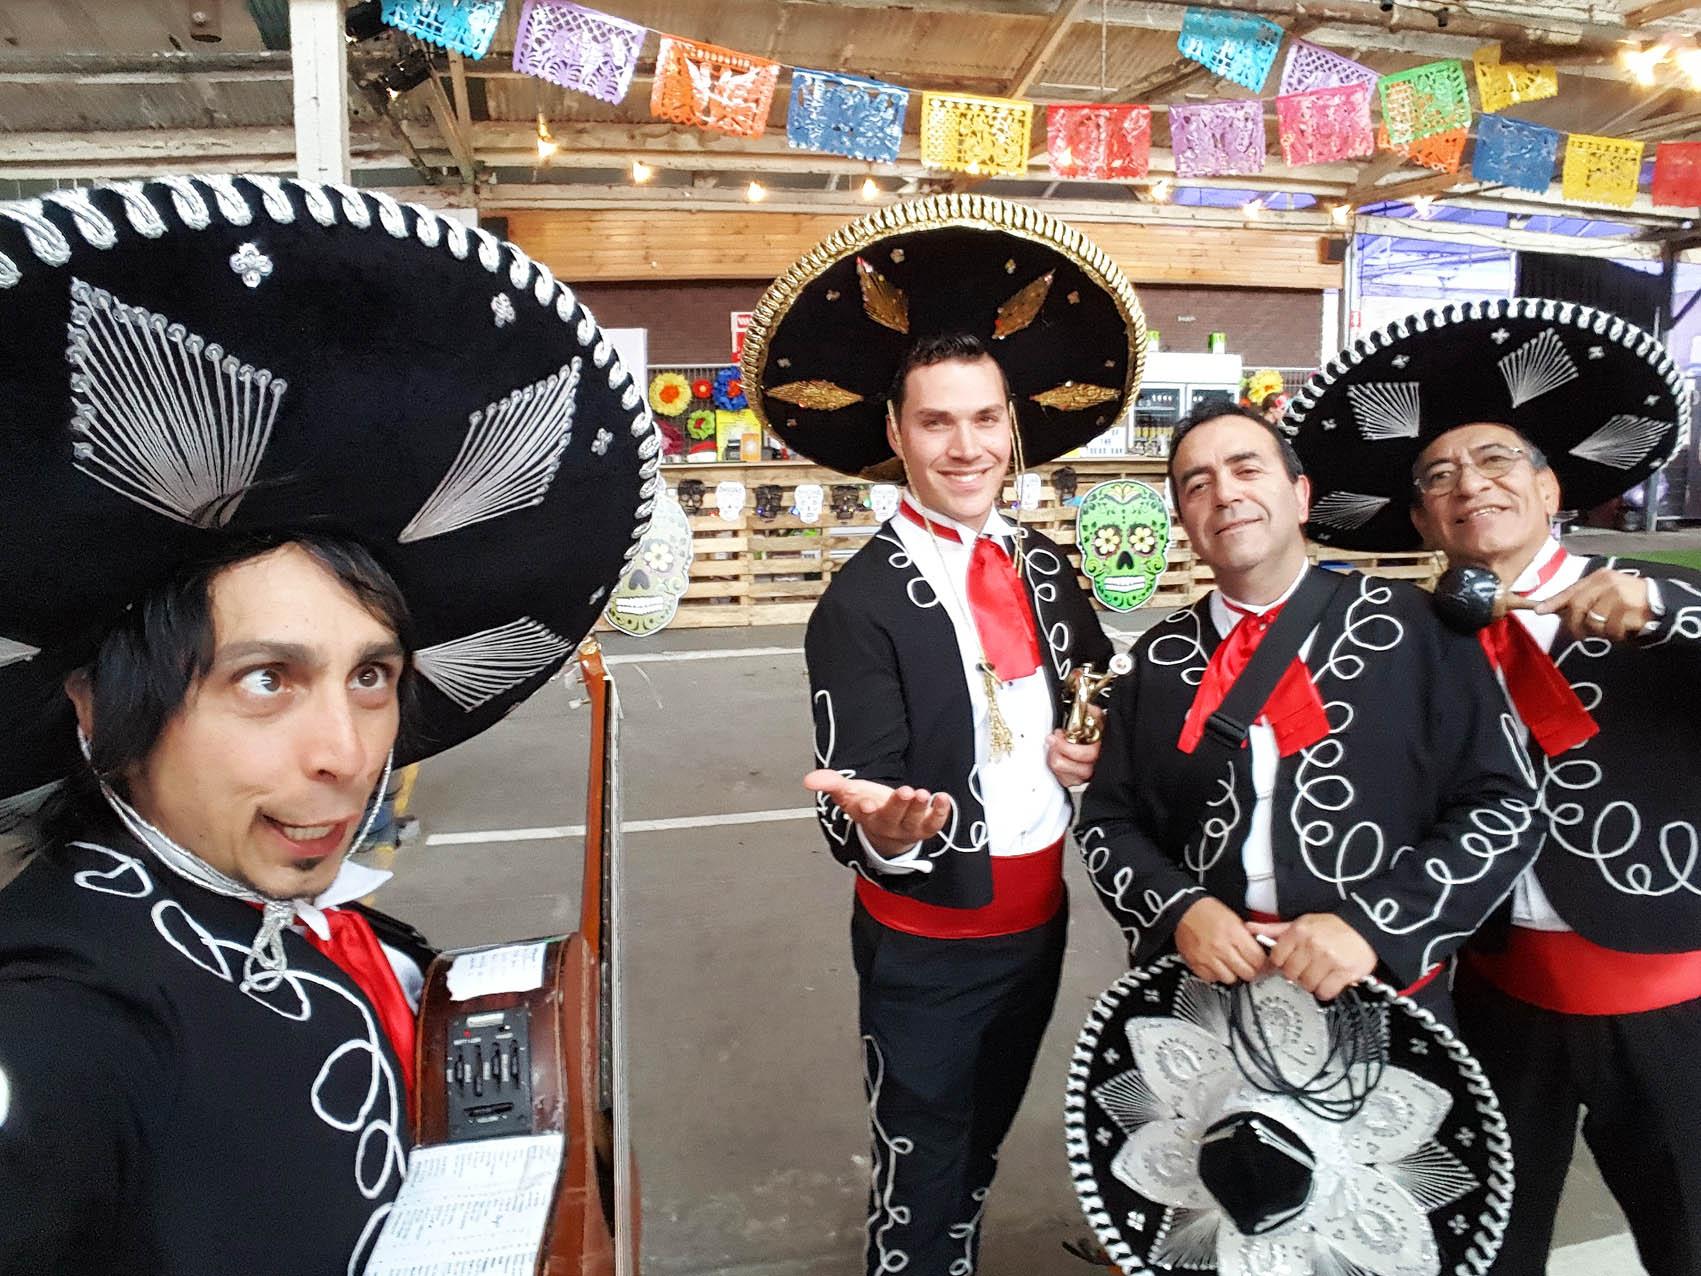 mexican-band-singapore-halifax-party-mariachi-adelaide-dubai-south-korea-sydney-melbourne